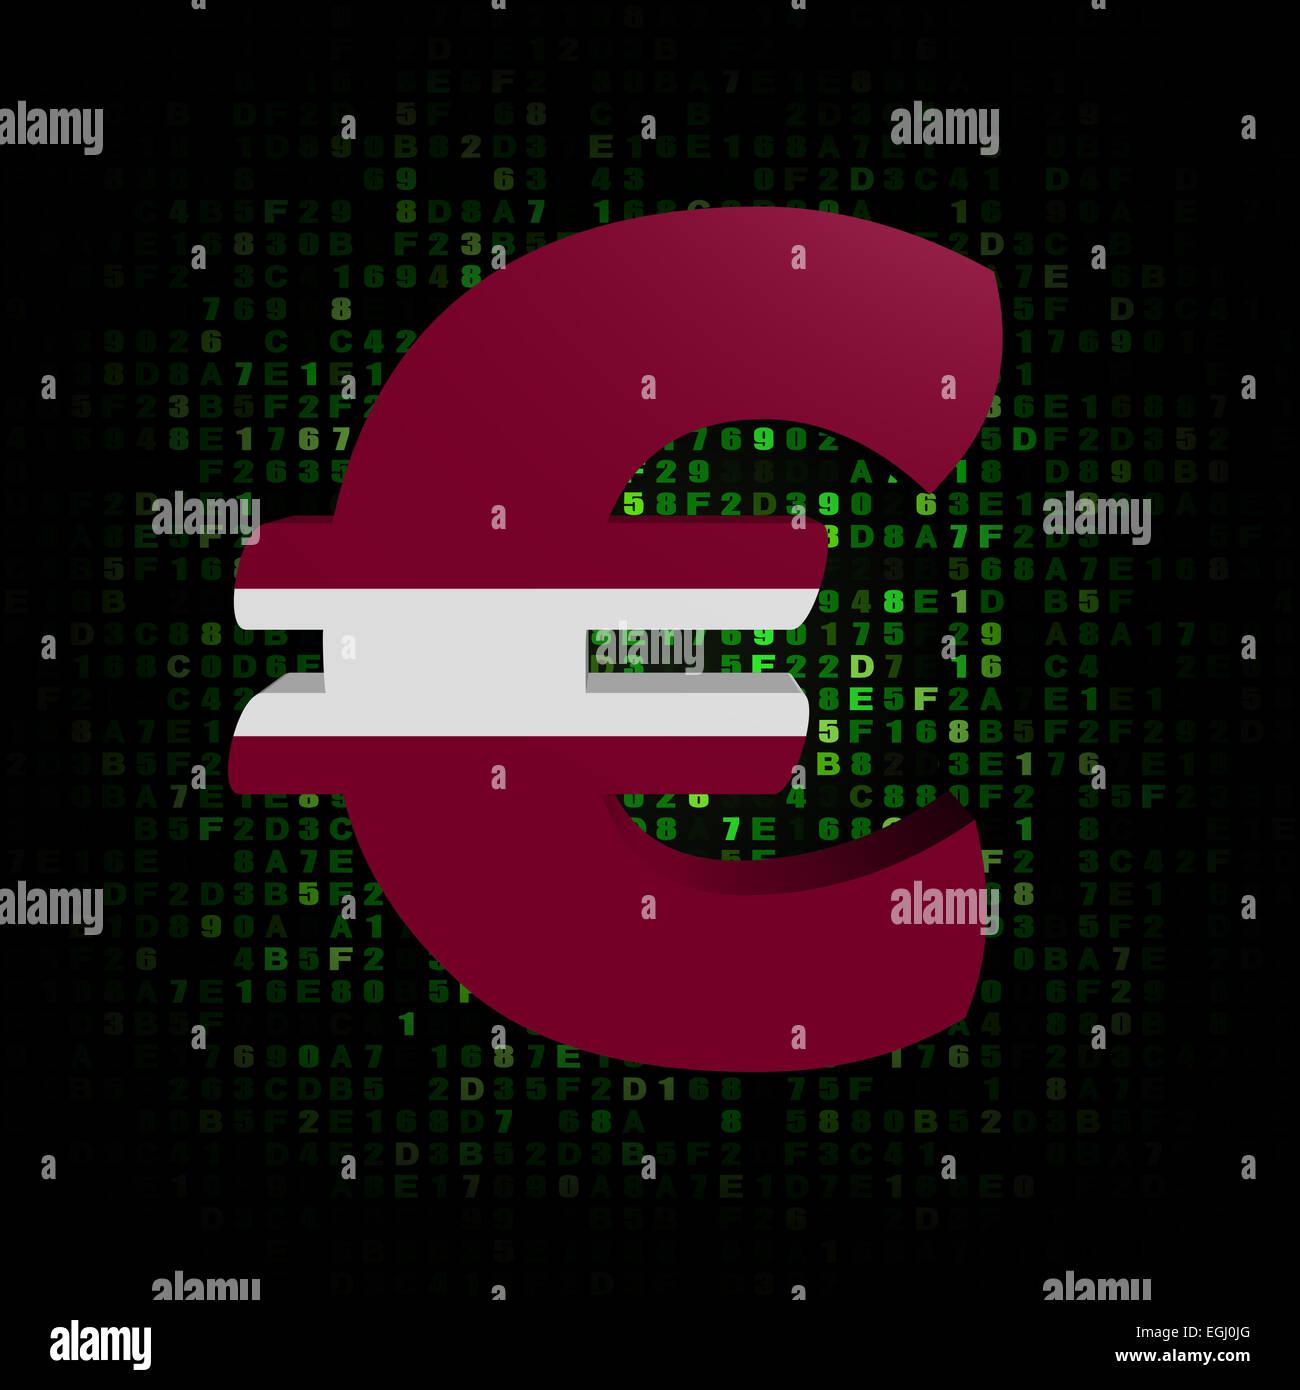 Euro Symbol With Latvian Flag On Hex Code Illustration Stock Photo